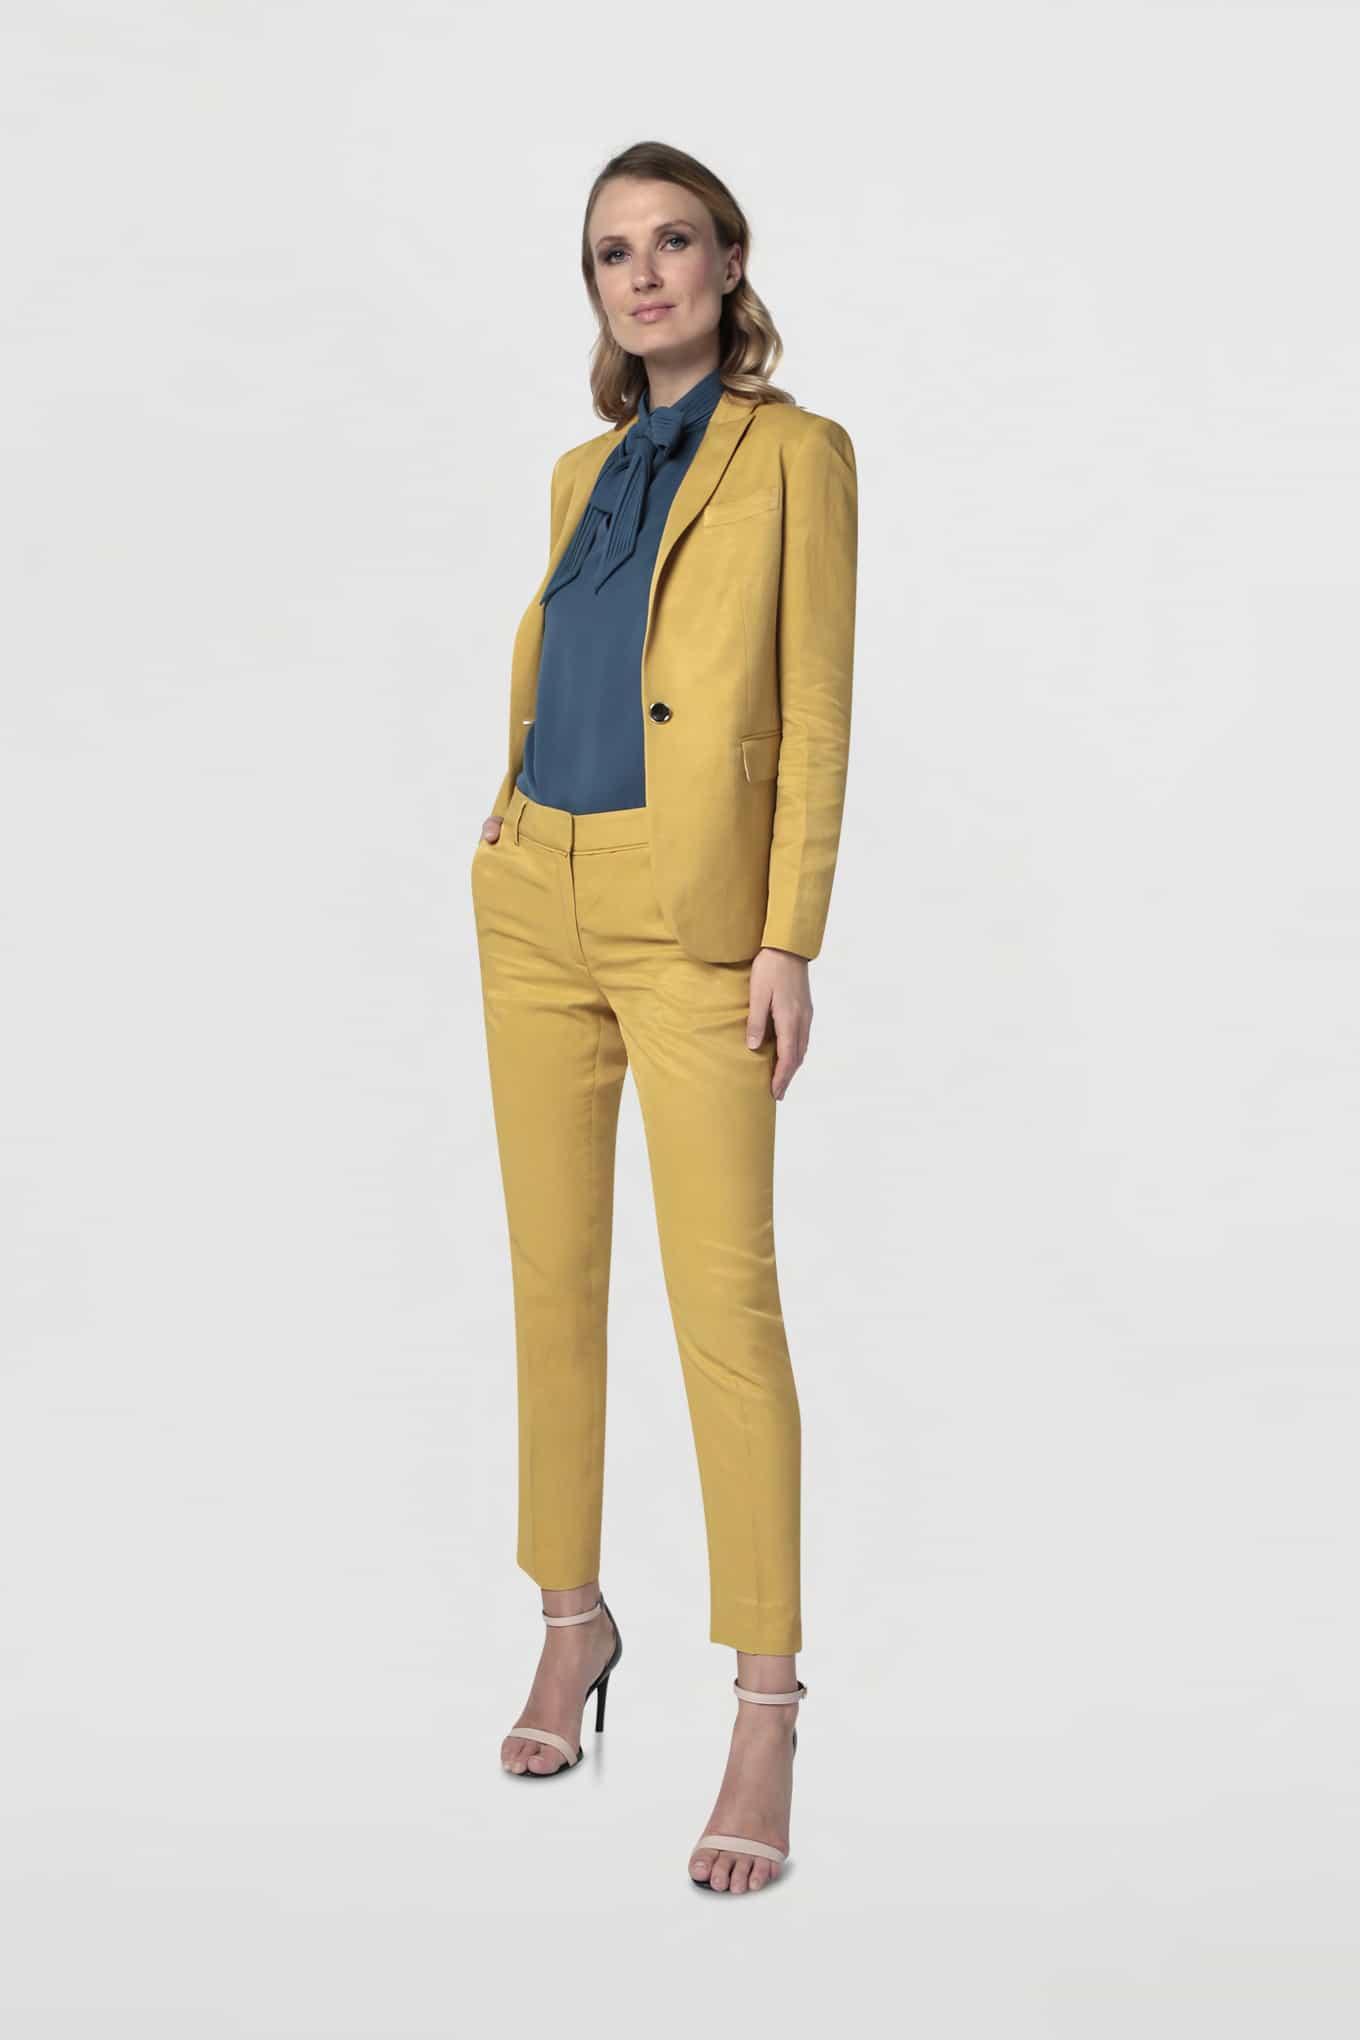 Blazer Yellow Classic Woman